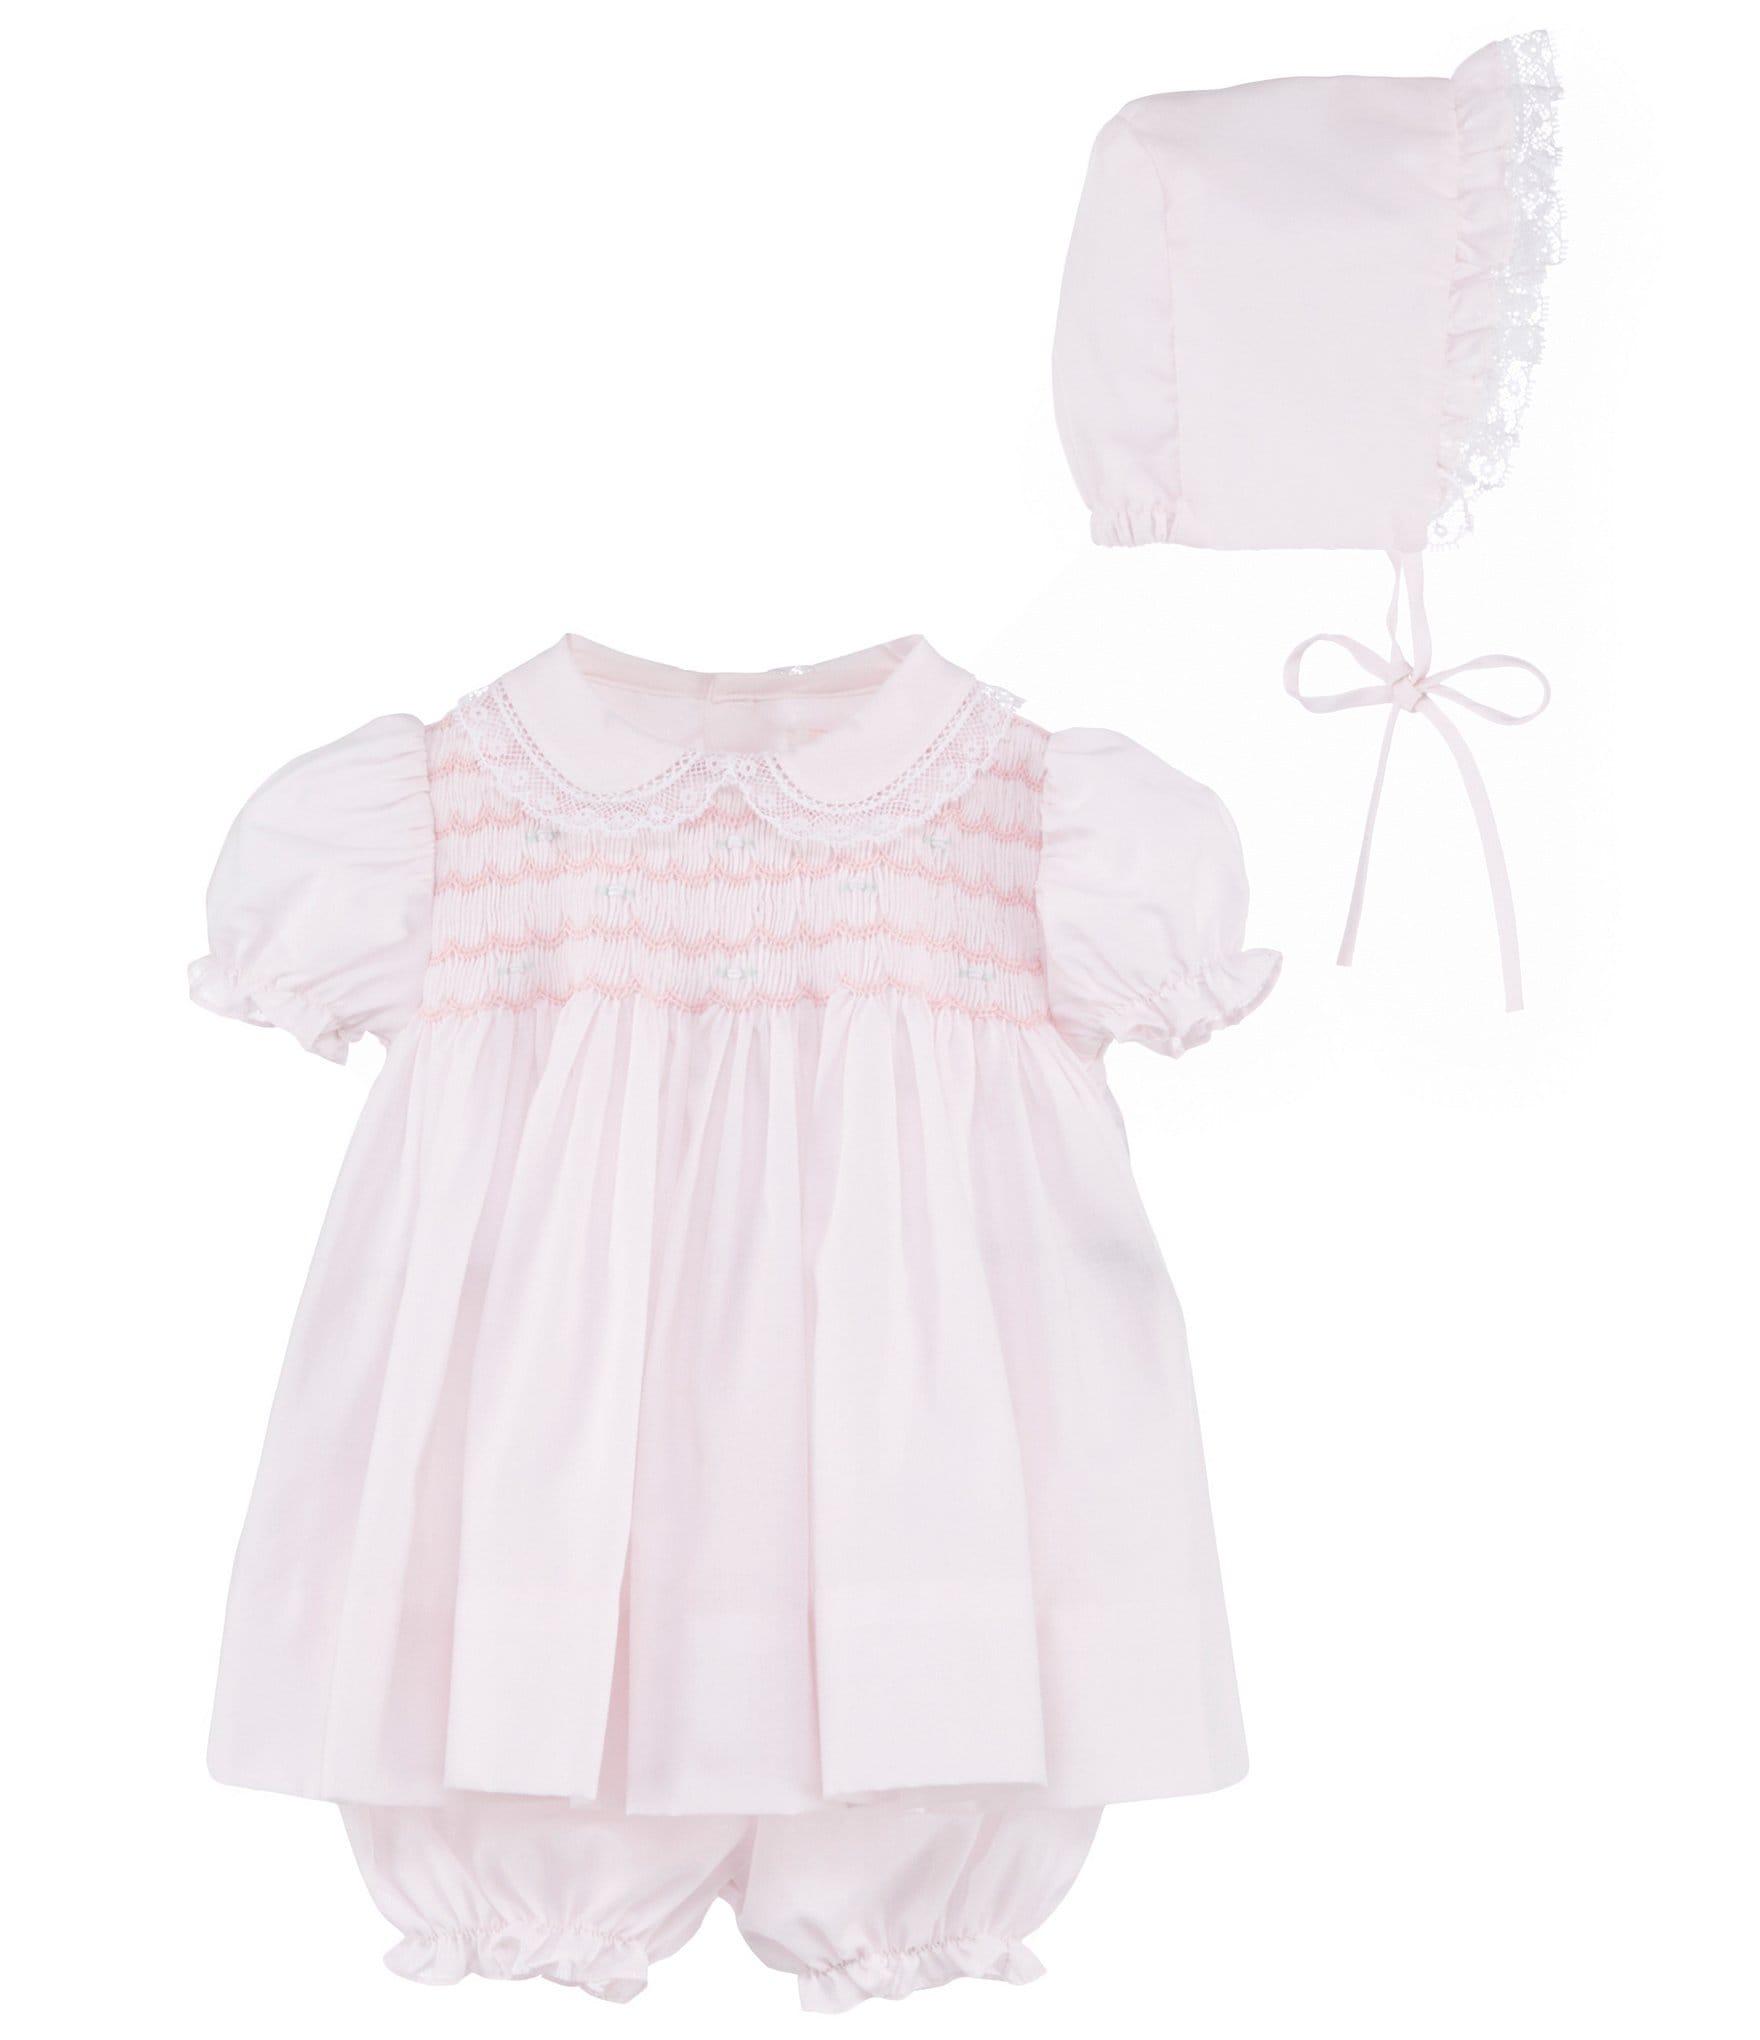 Baby Girl Clothing Dillards